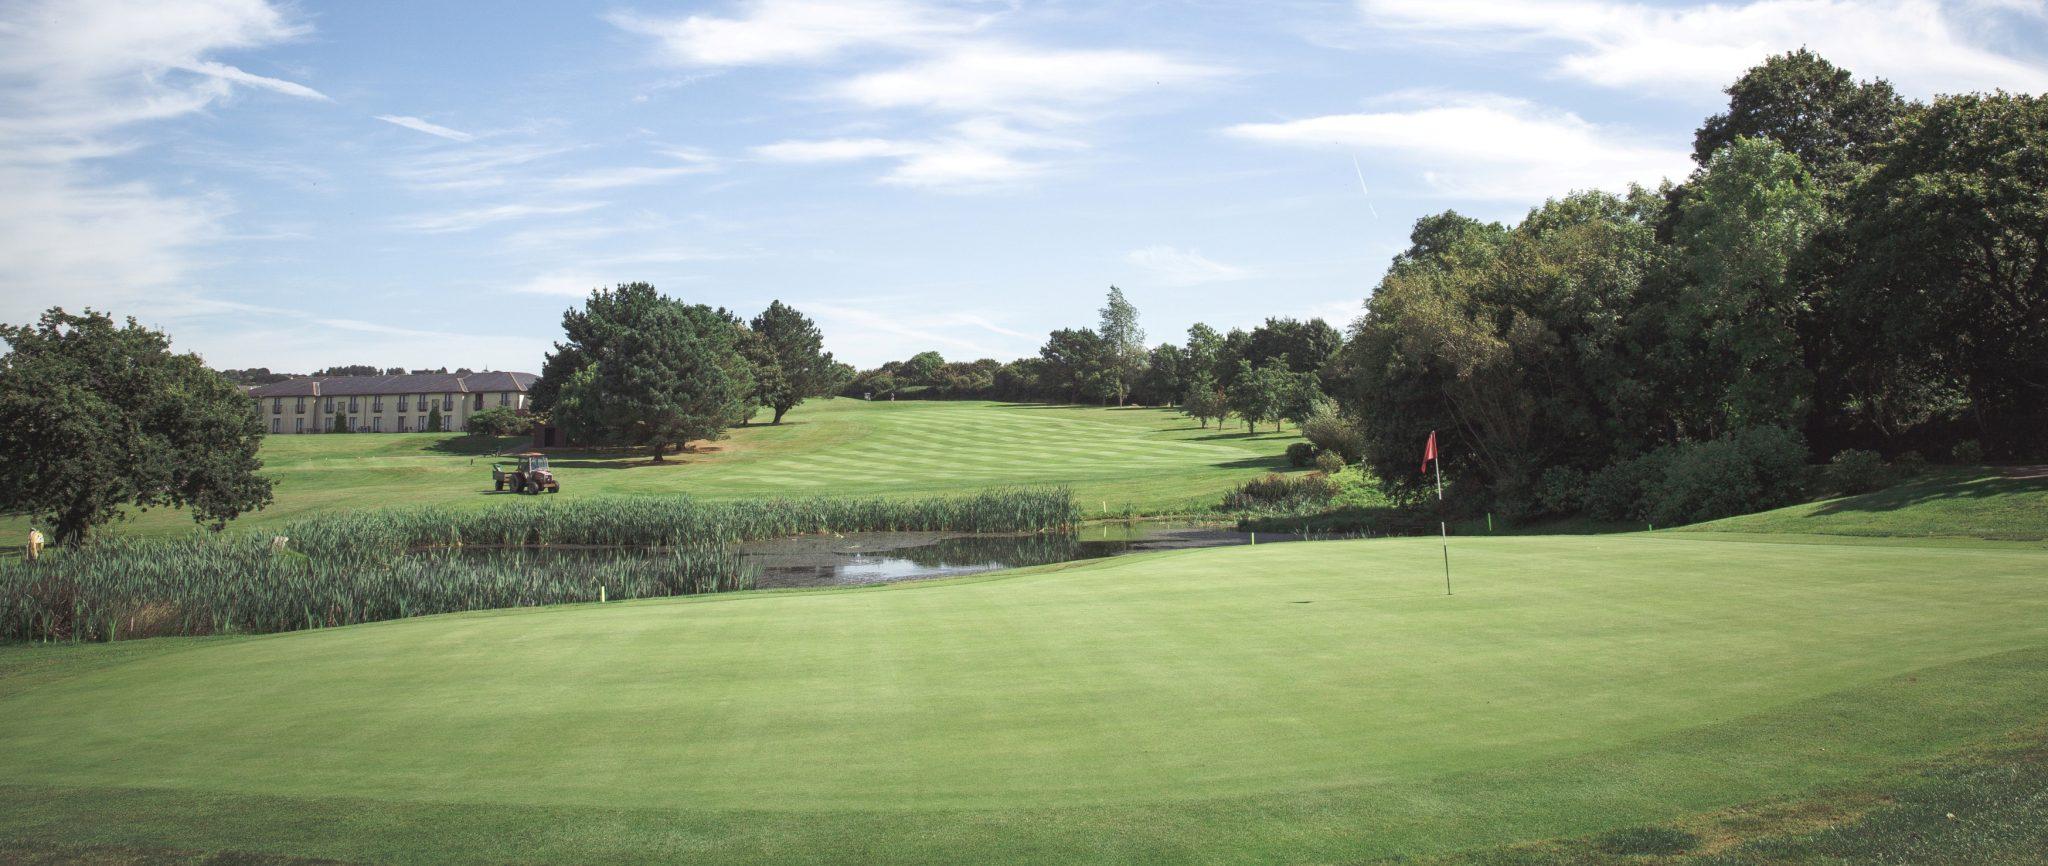 Lanhydrock Golfcourse Aug (72)-41 - Copy